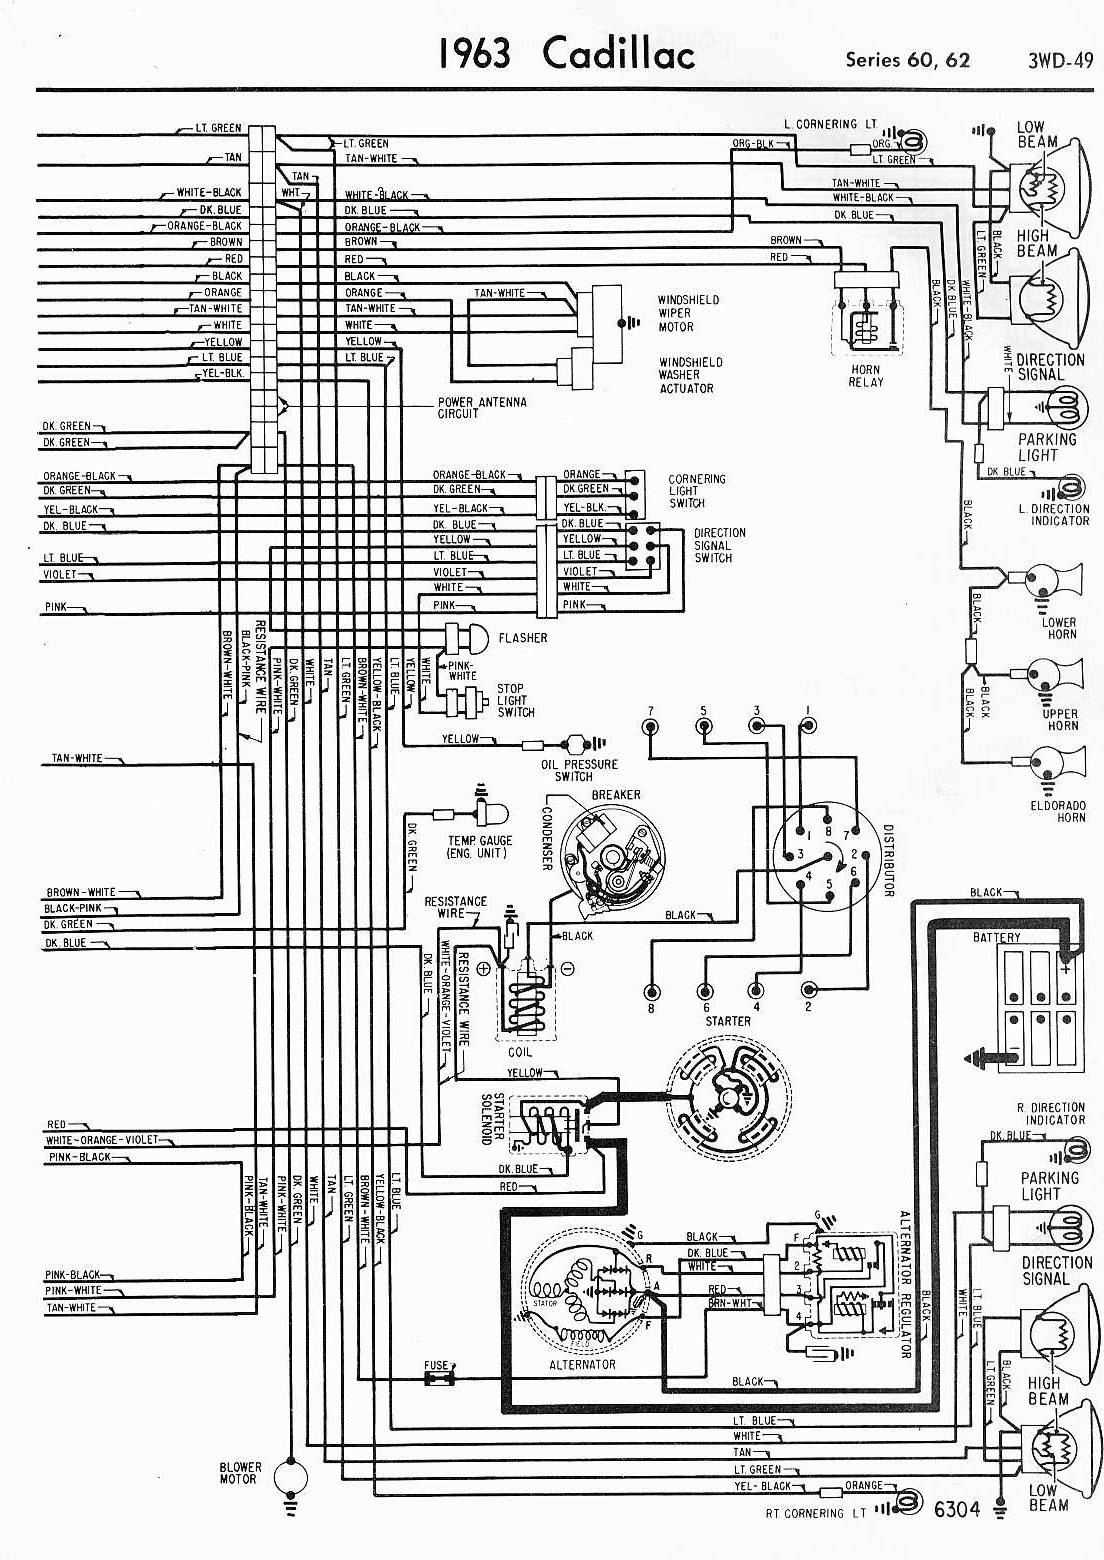 1978 Cadillac Seville Fuel Wiring Diagram Electrical Diagrams 1958 Deville Schematic Smart U2022 1980